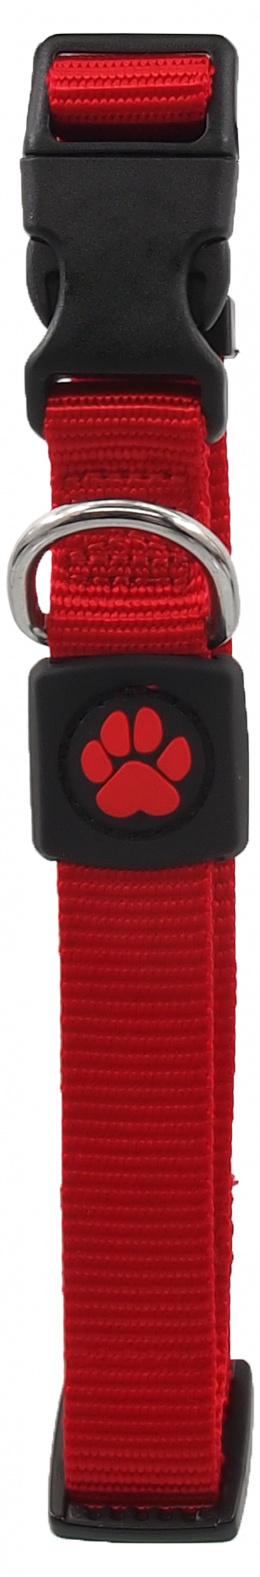 Obojek Active Dog Premium M červený 2x34-49cm